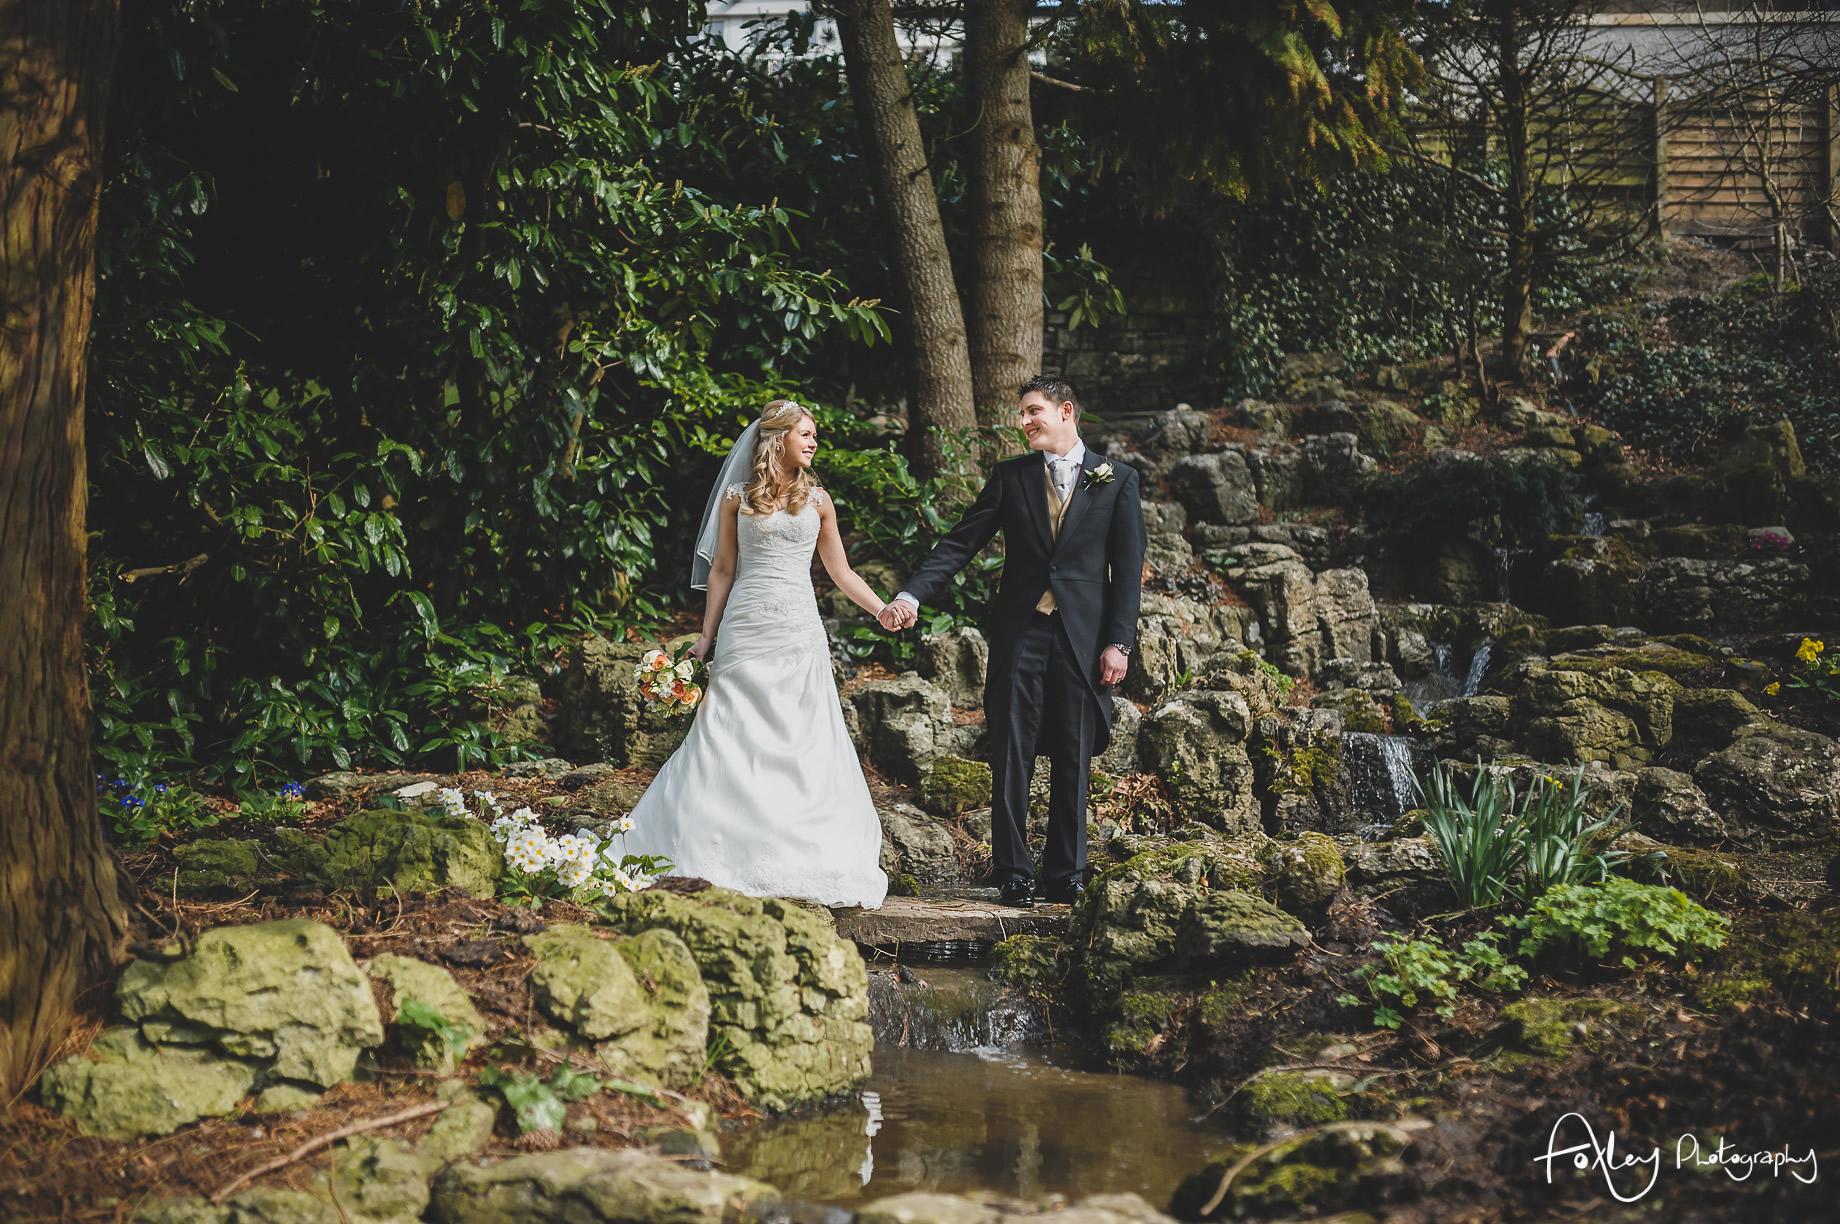 Gemma and Lewis' Wedding at Mitton Hall 111